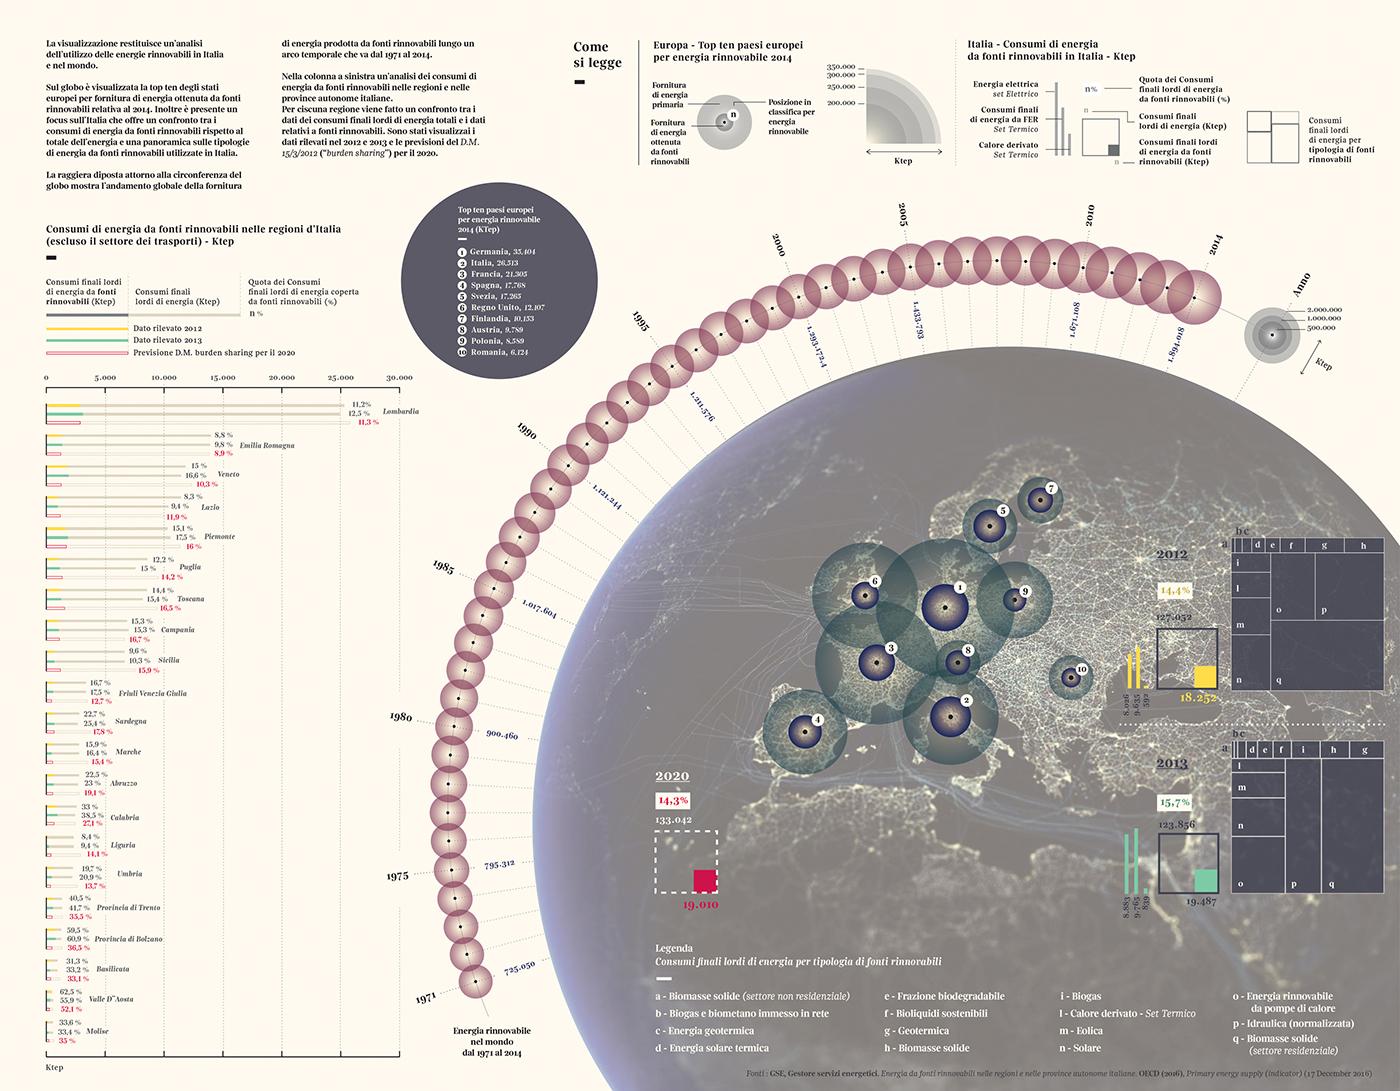 renewable renewableenergy dataviz DATAVISUALIZATION editorial visualjournalism infographic corrieredellasera press